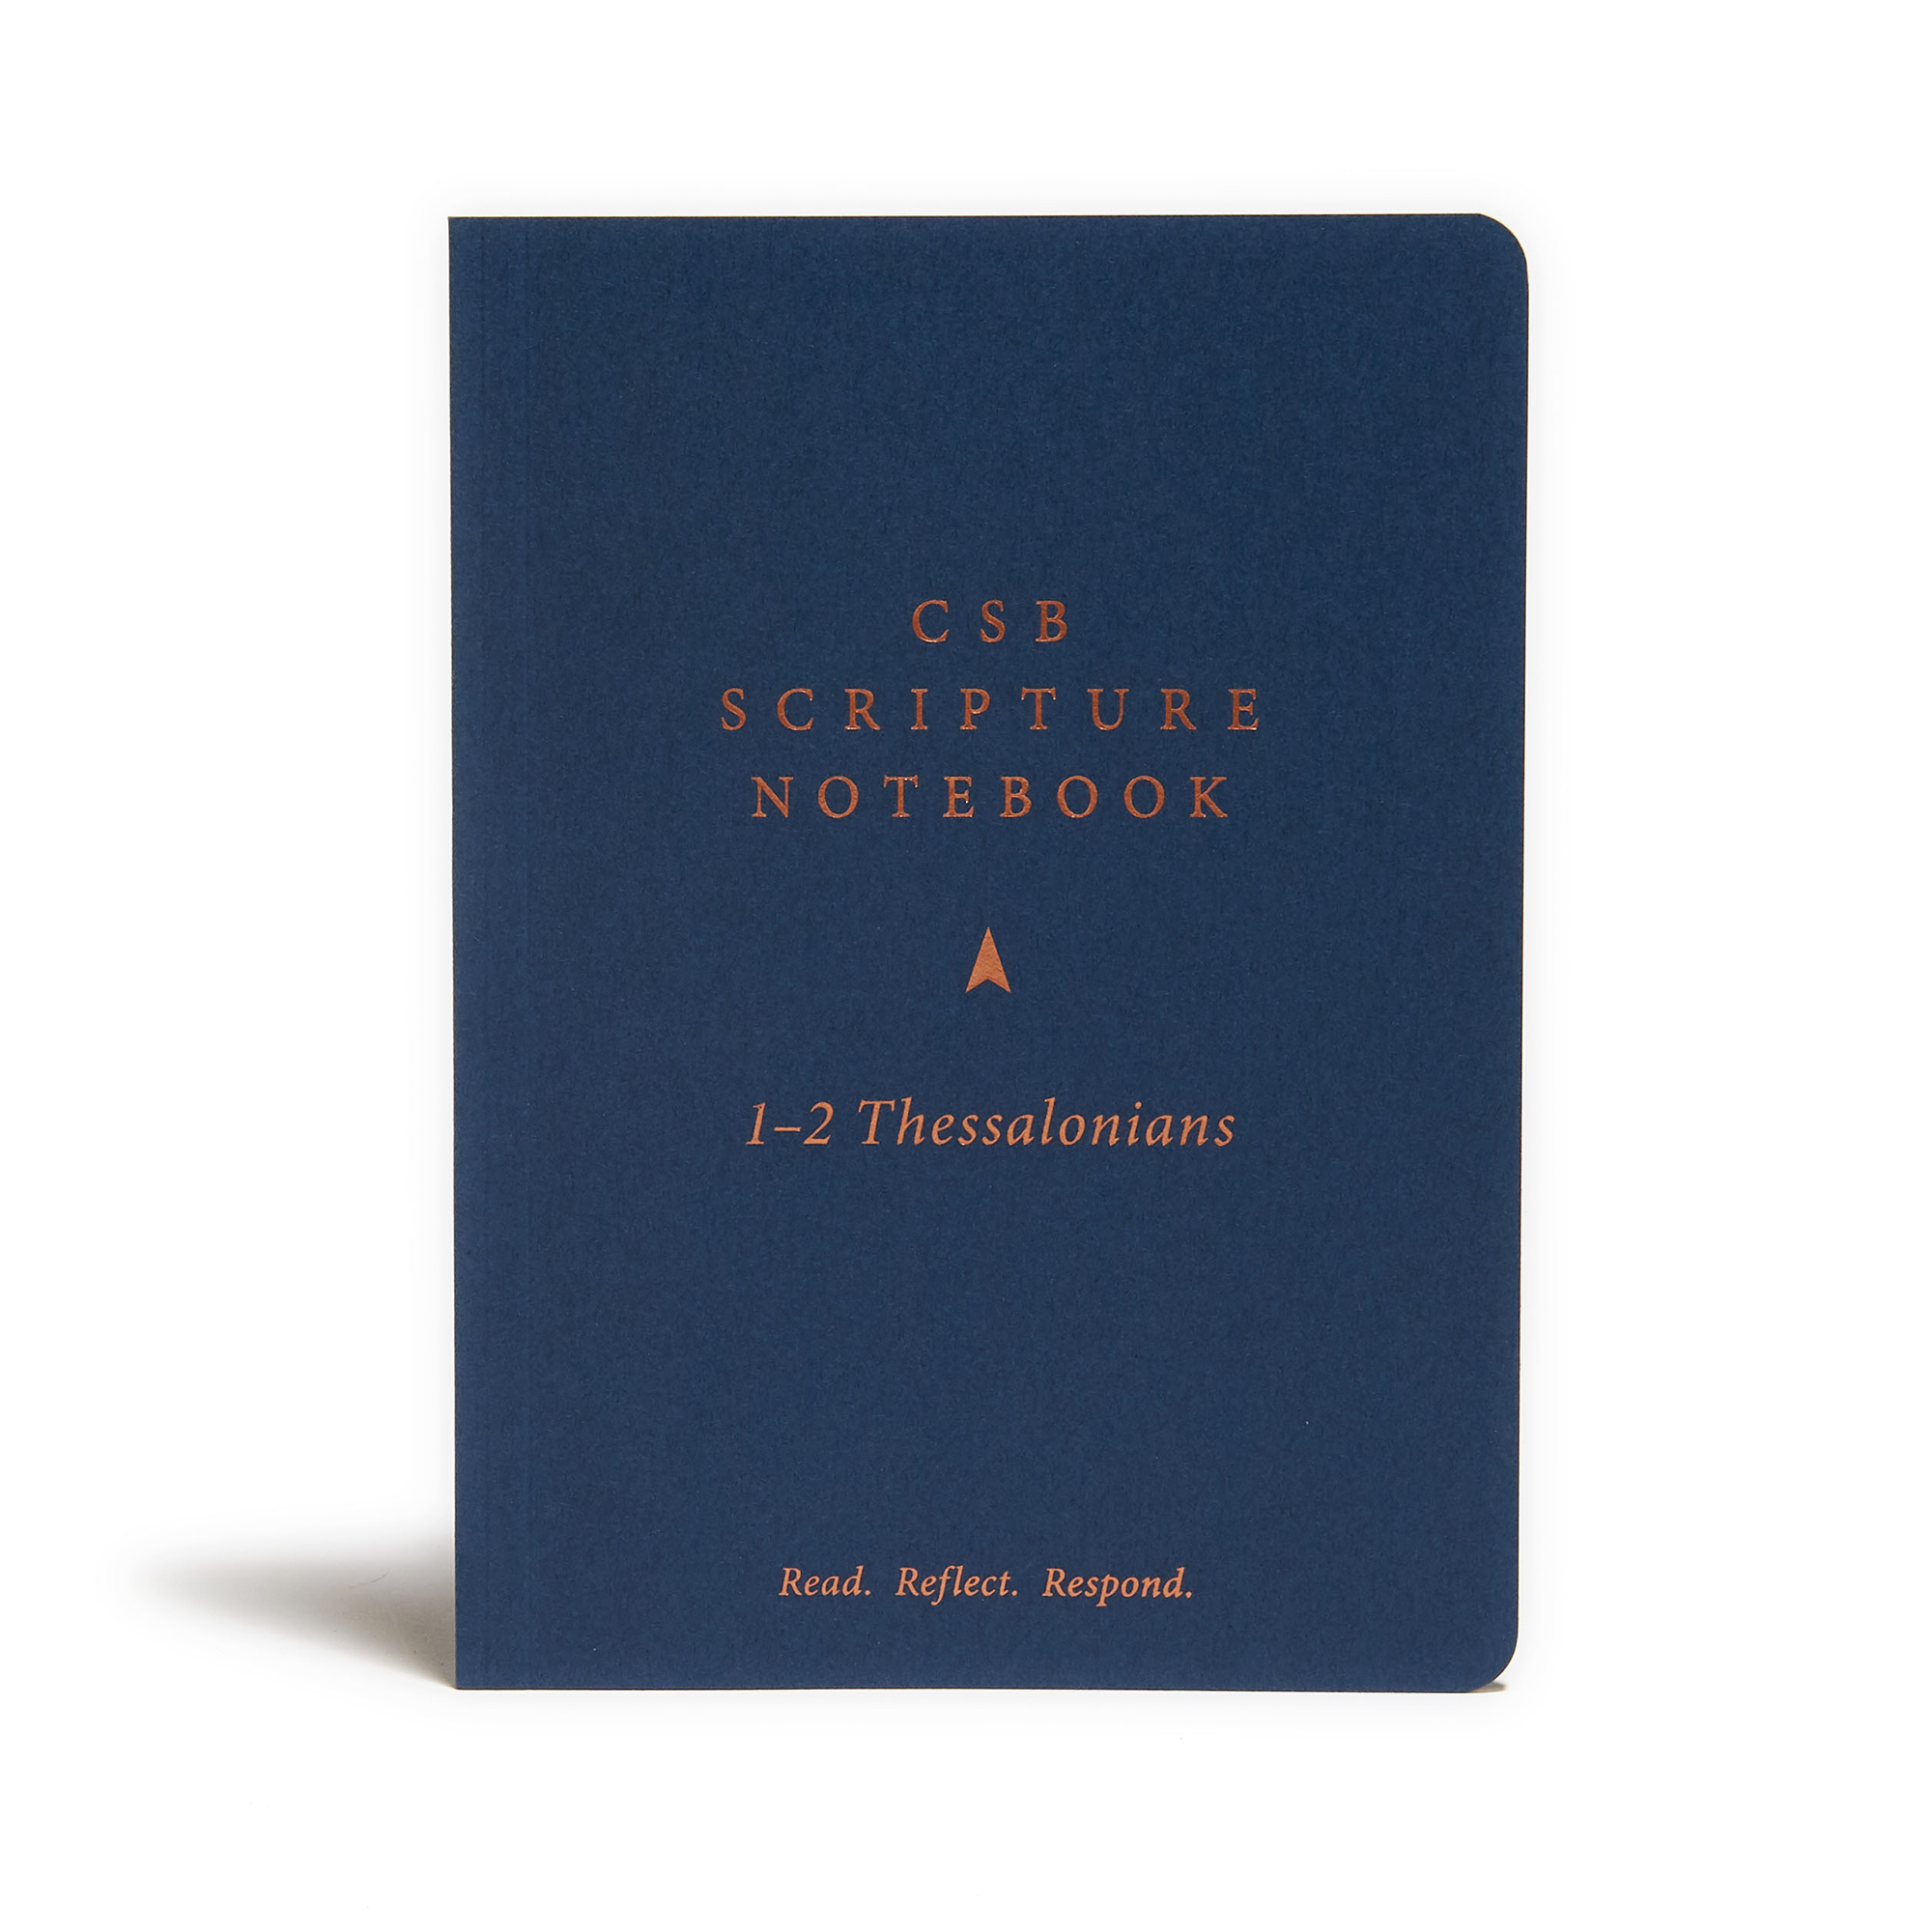 CSB Scripture Notebook, 1-2 Thessalonians: Read. Reflect. Respond. CSB Bibles by Holman